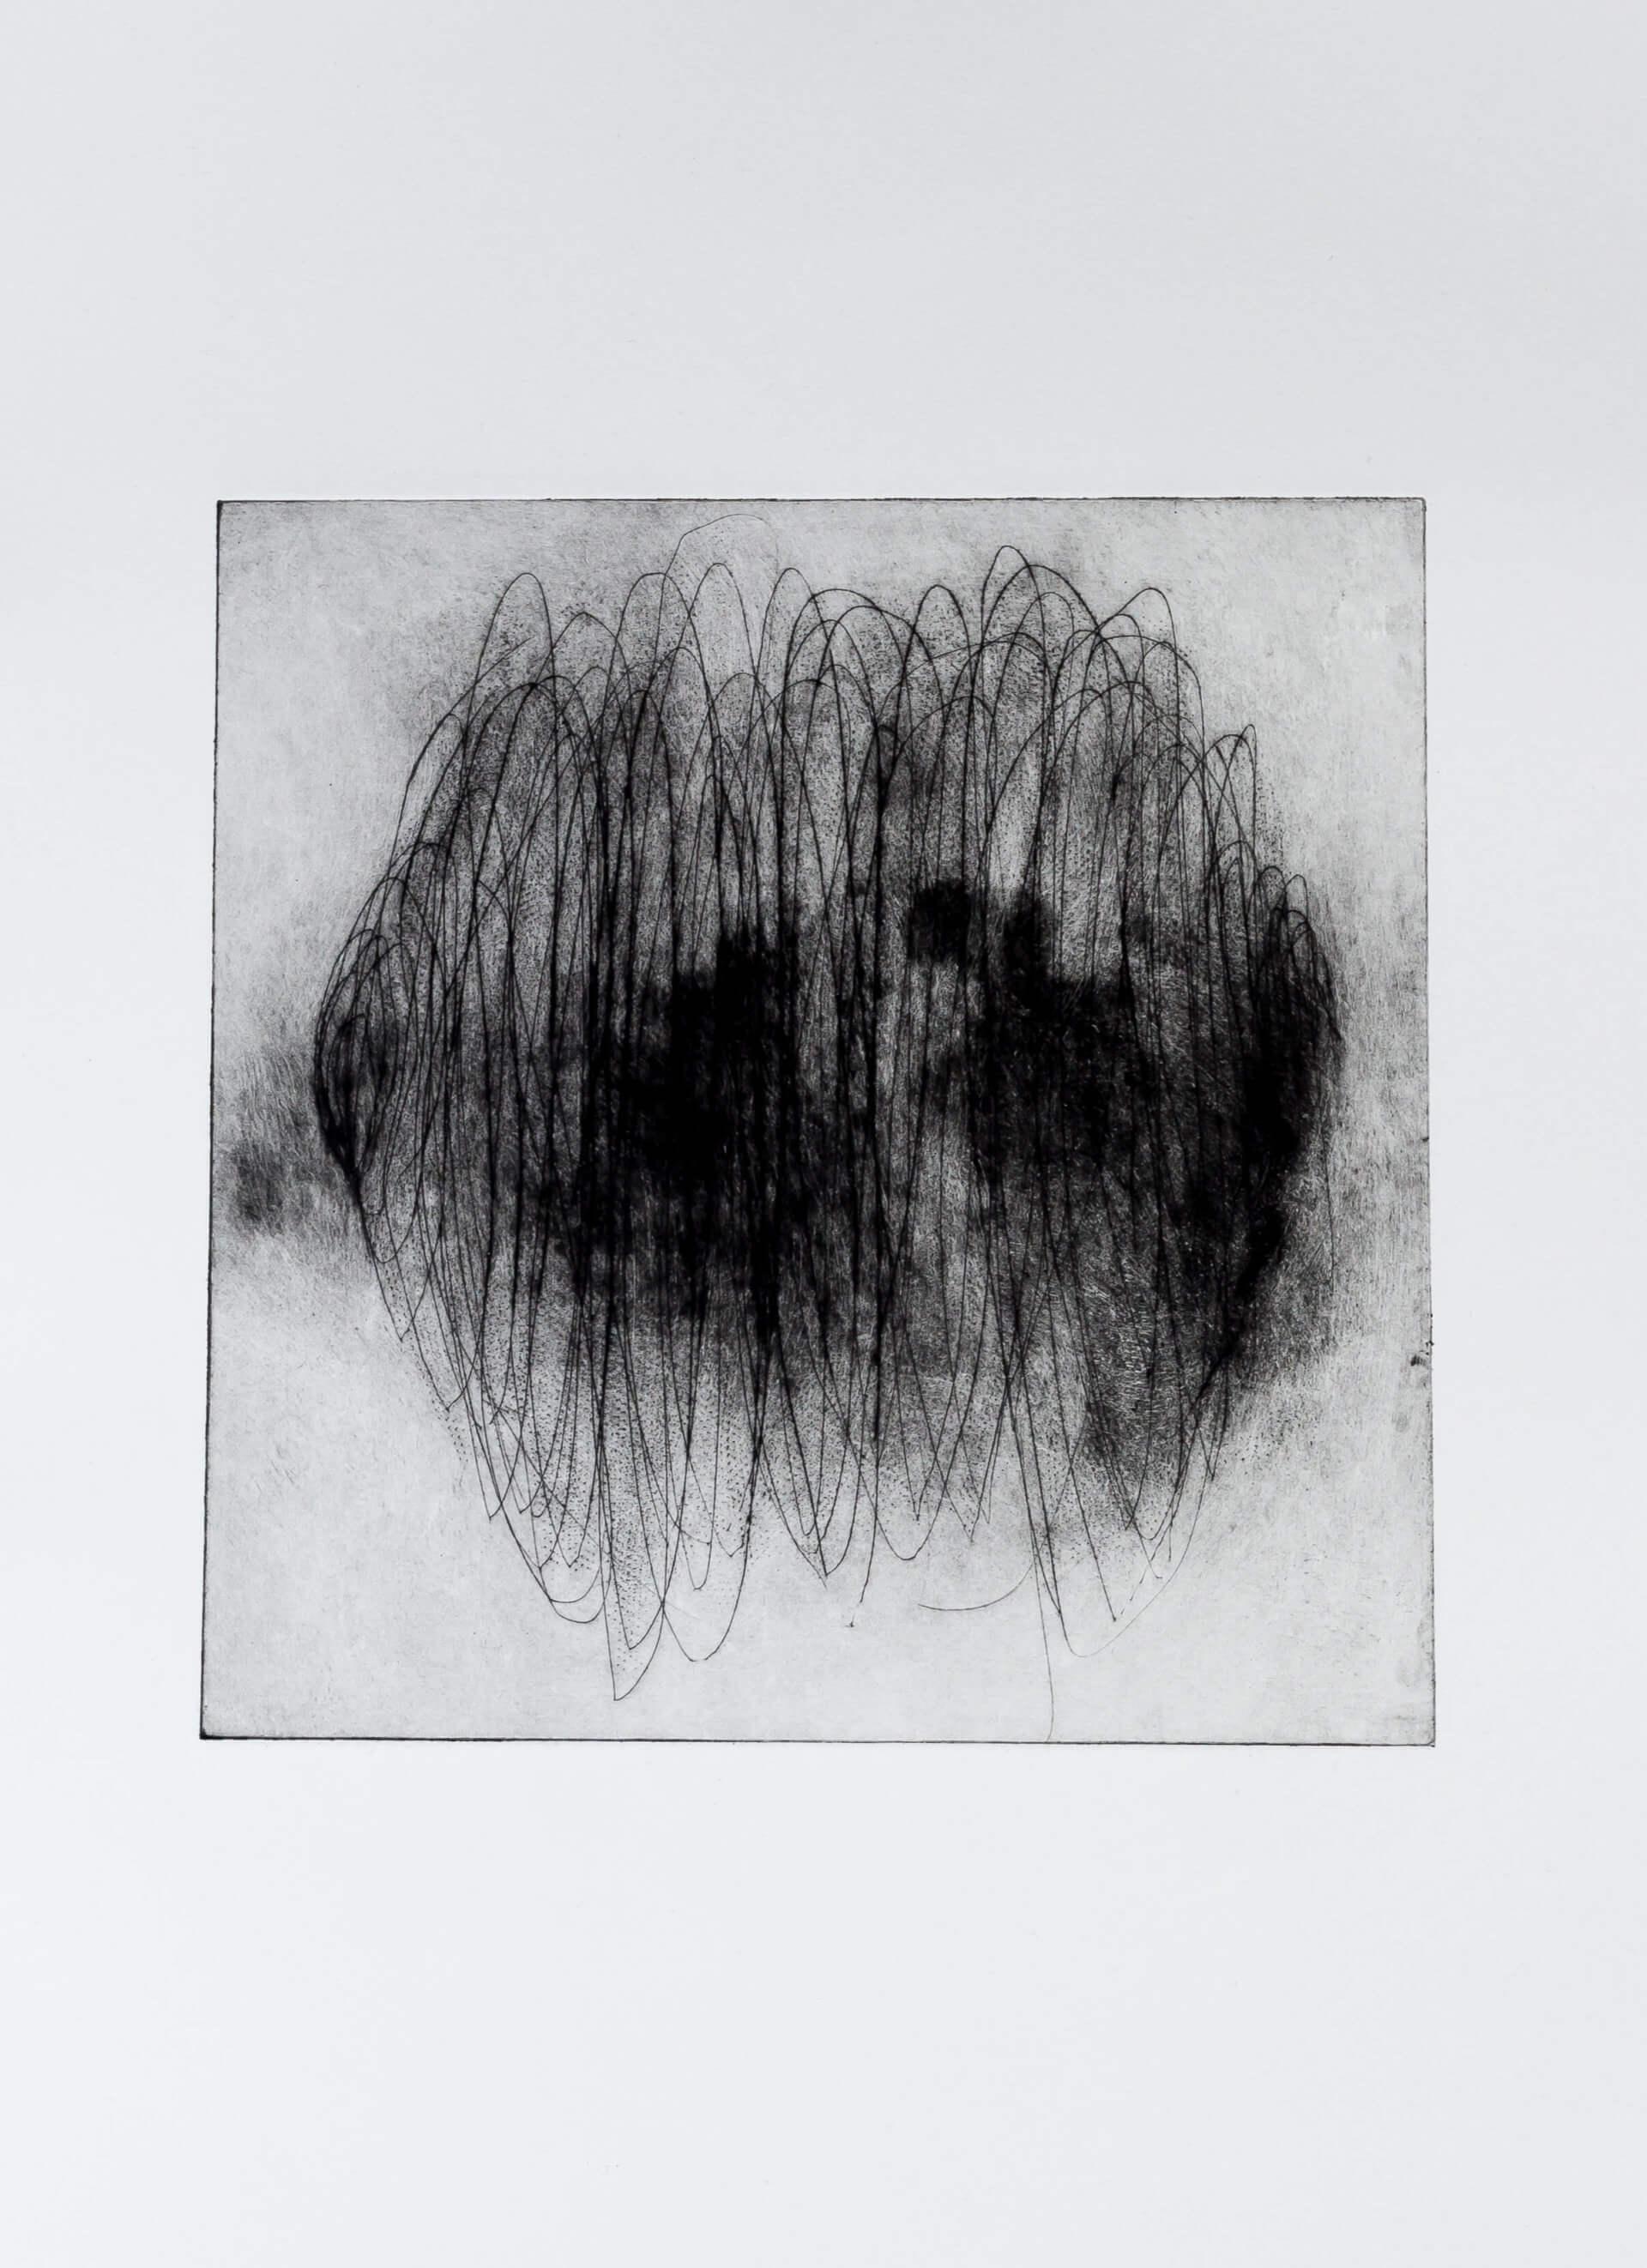 Katharina Albers, Transformation XV.I, 2011, Radierung, Unikat, 24x23,5cm